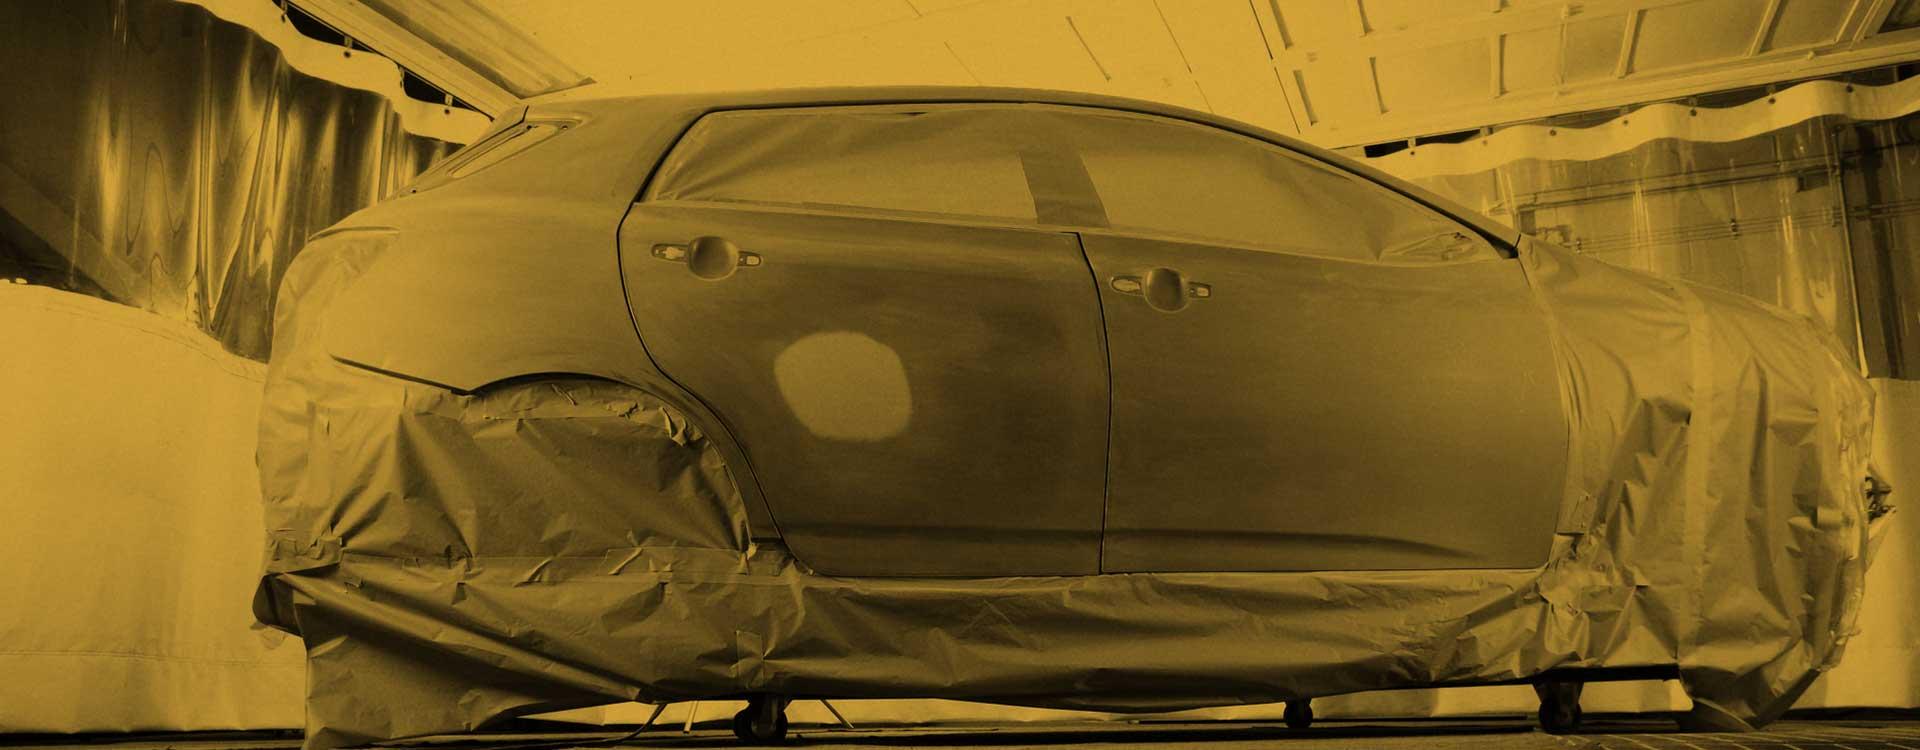 Auto Frame Repair & Alignment Denver | Golden Coach Works